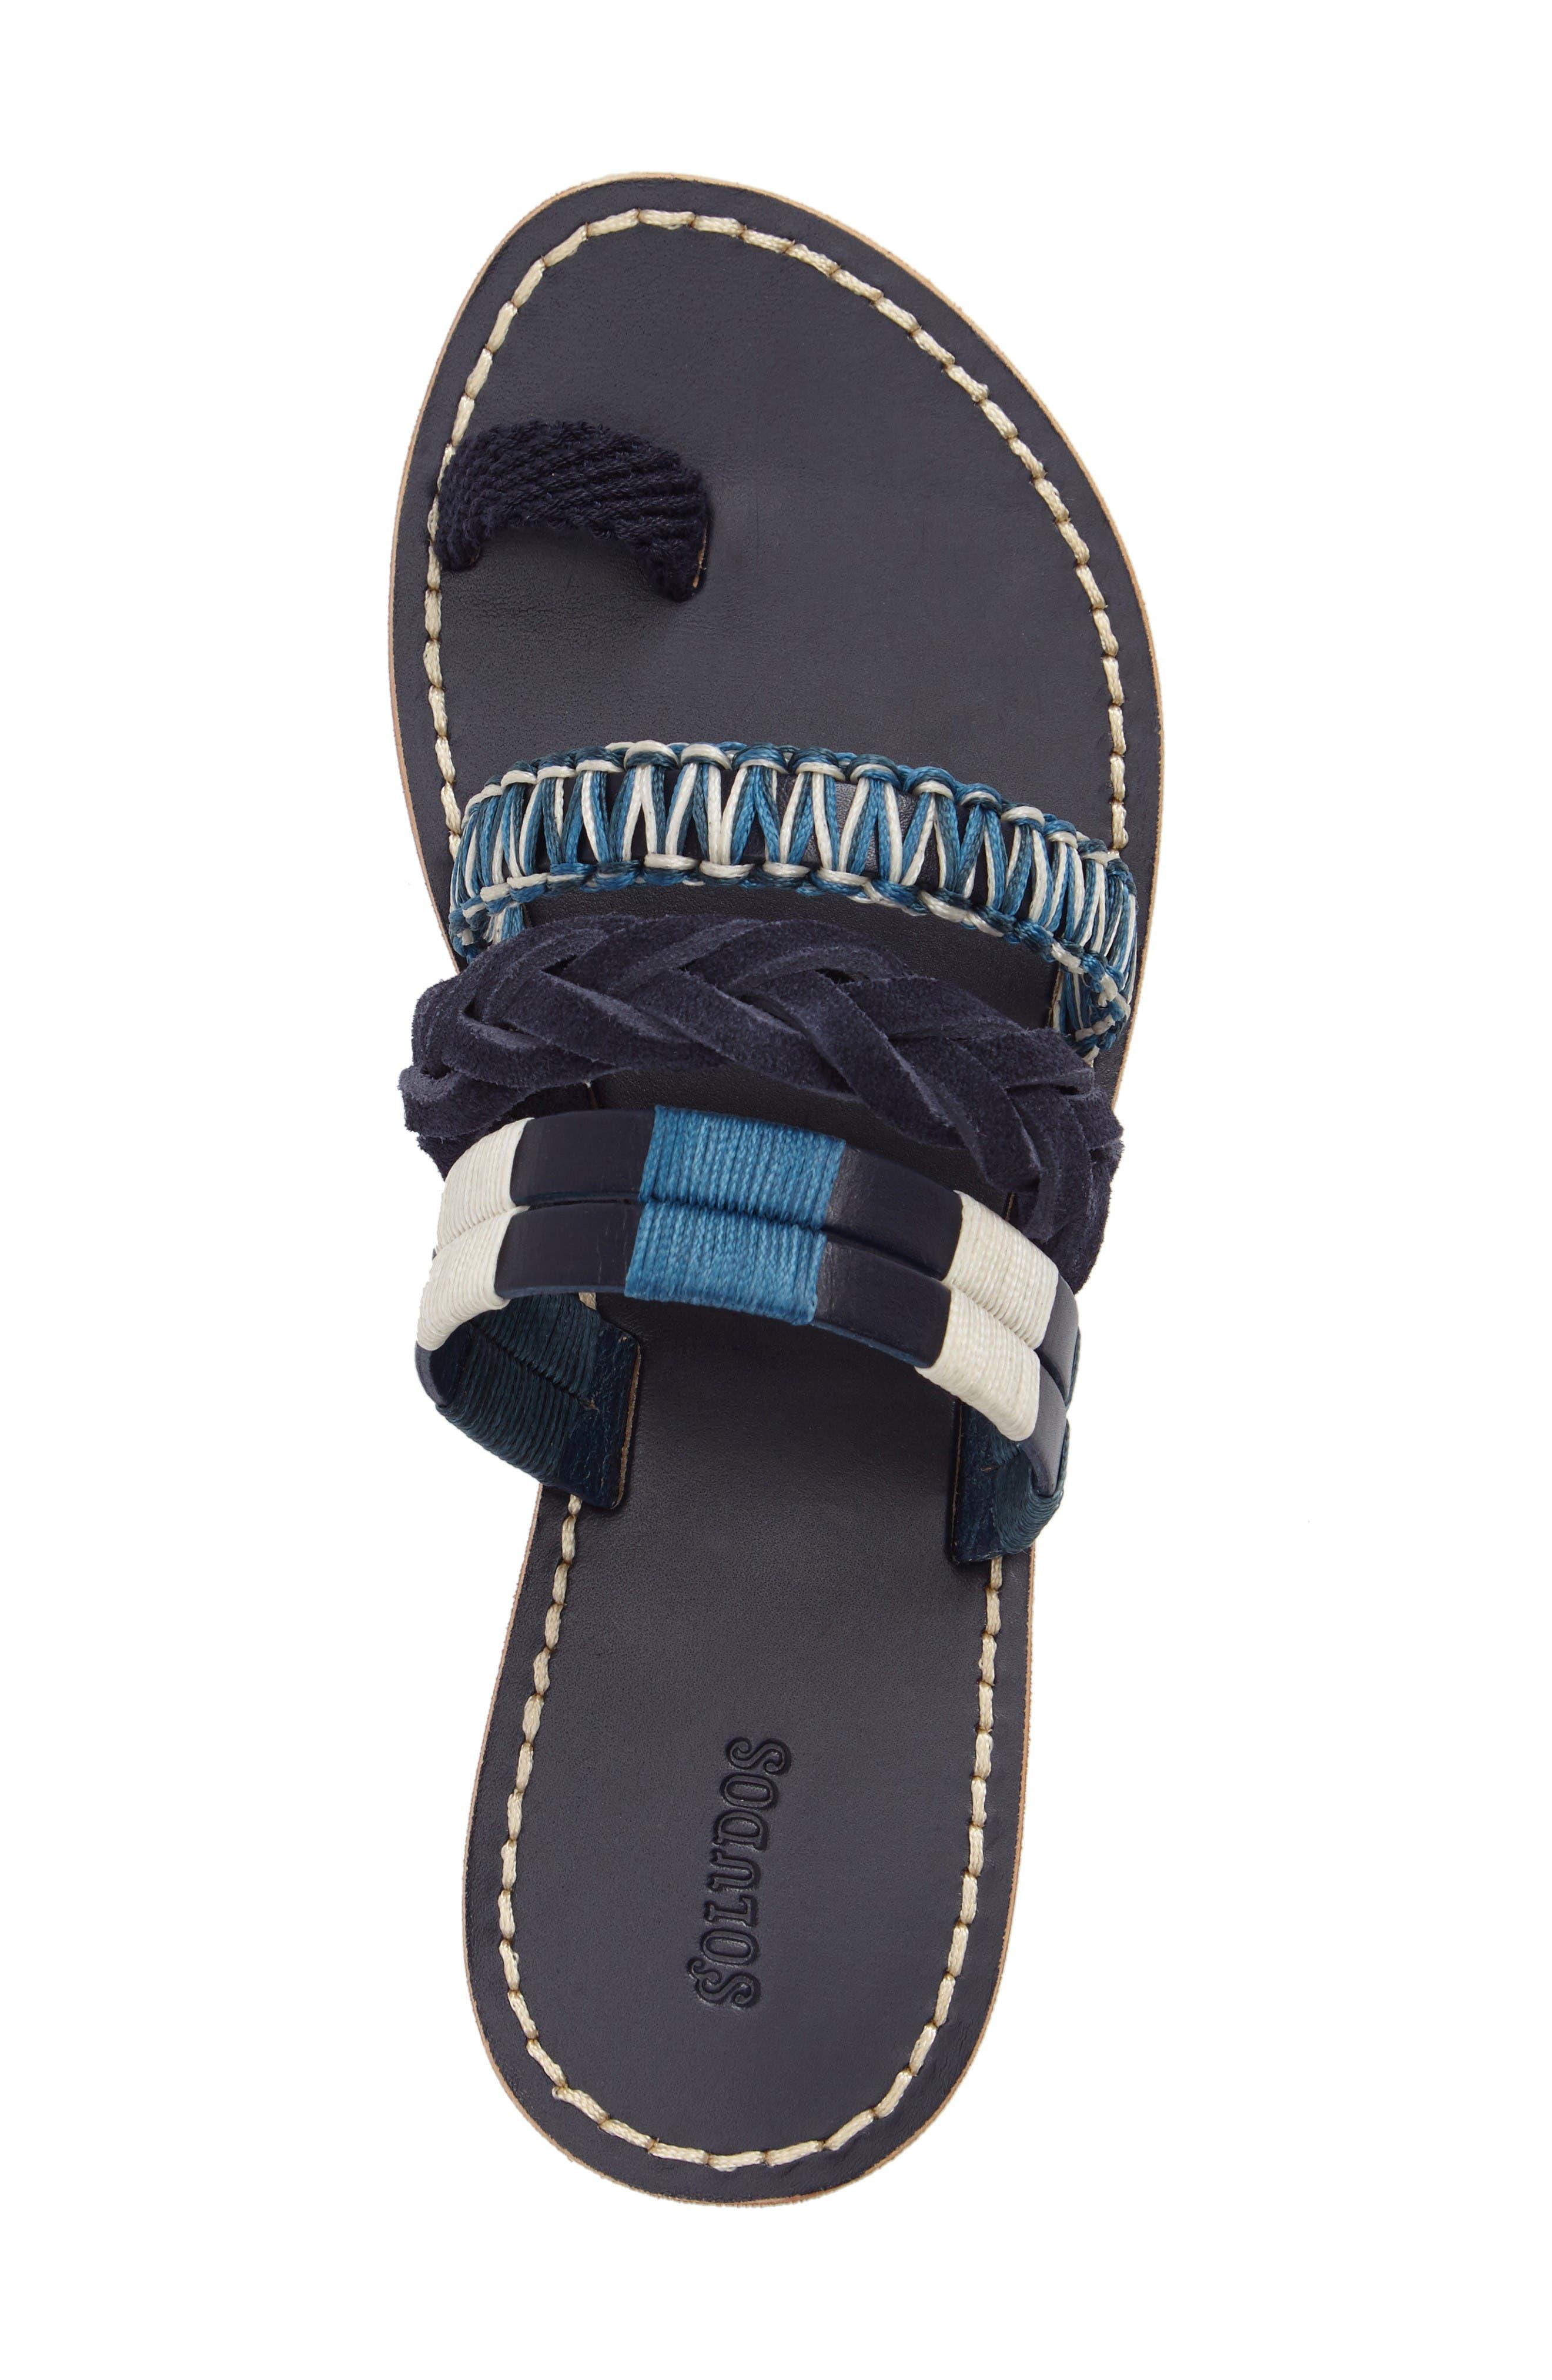 Slide Sandal,                             Alternate thumbnail 6, color,                             Midnight/ Blue Multi Leather